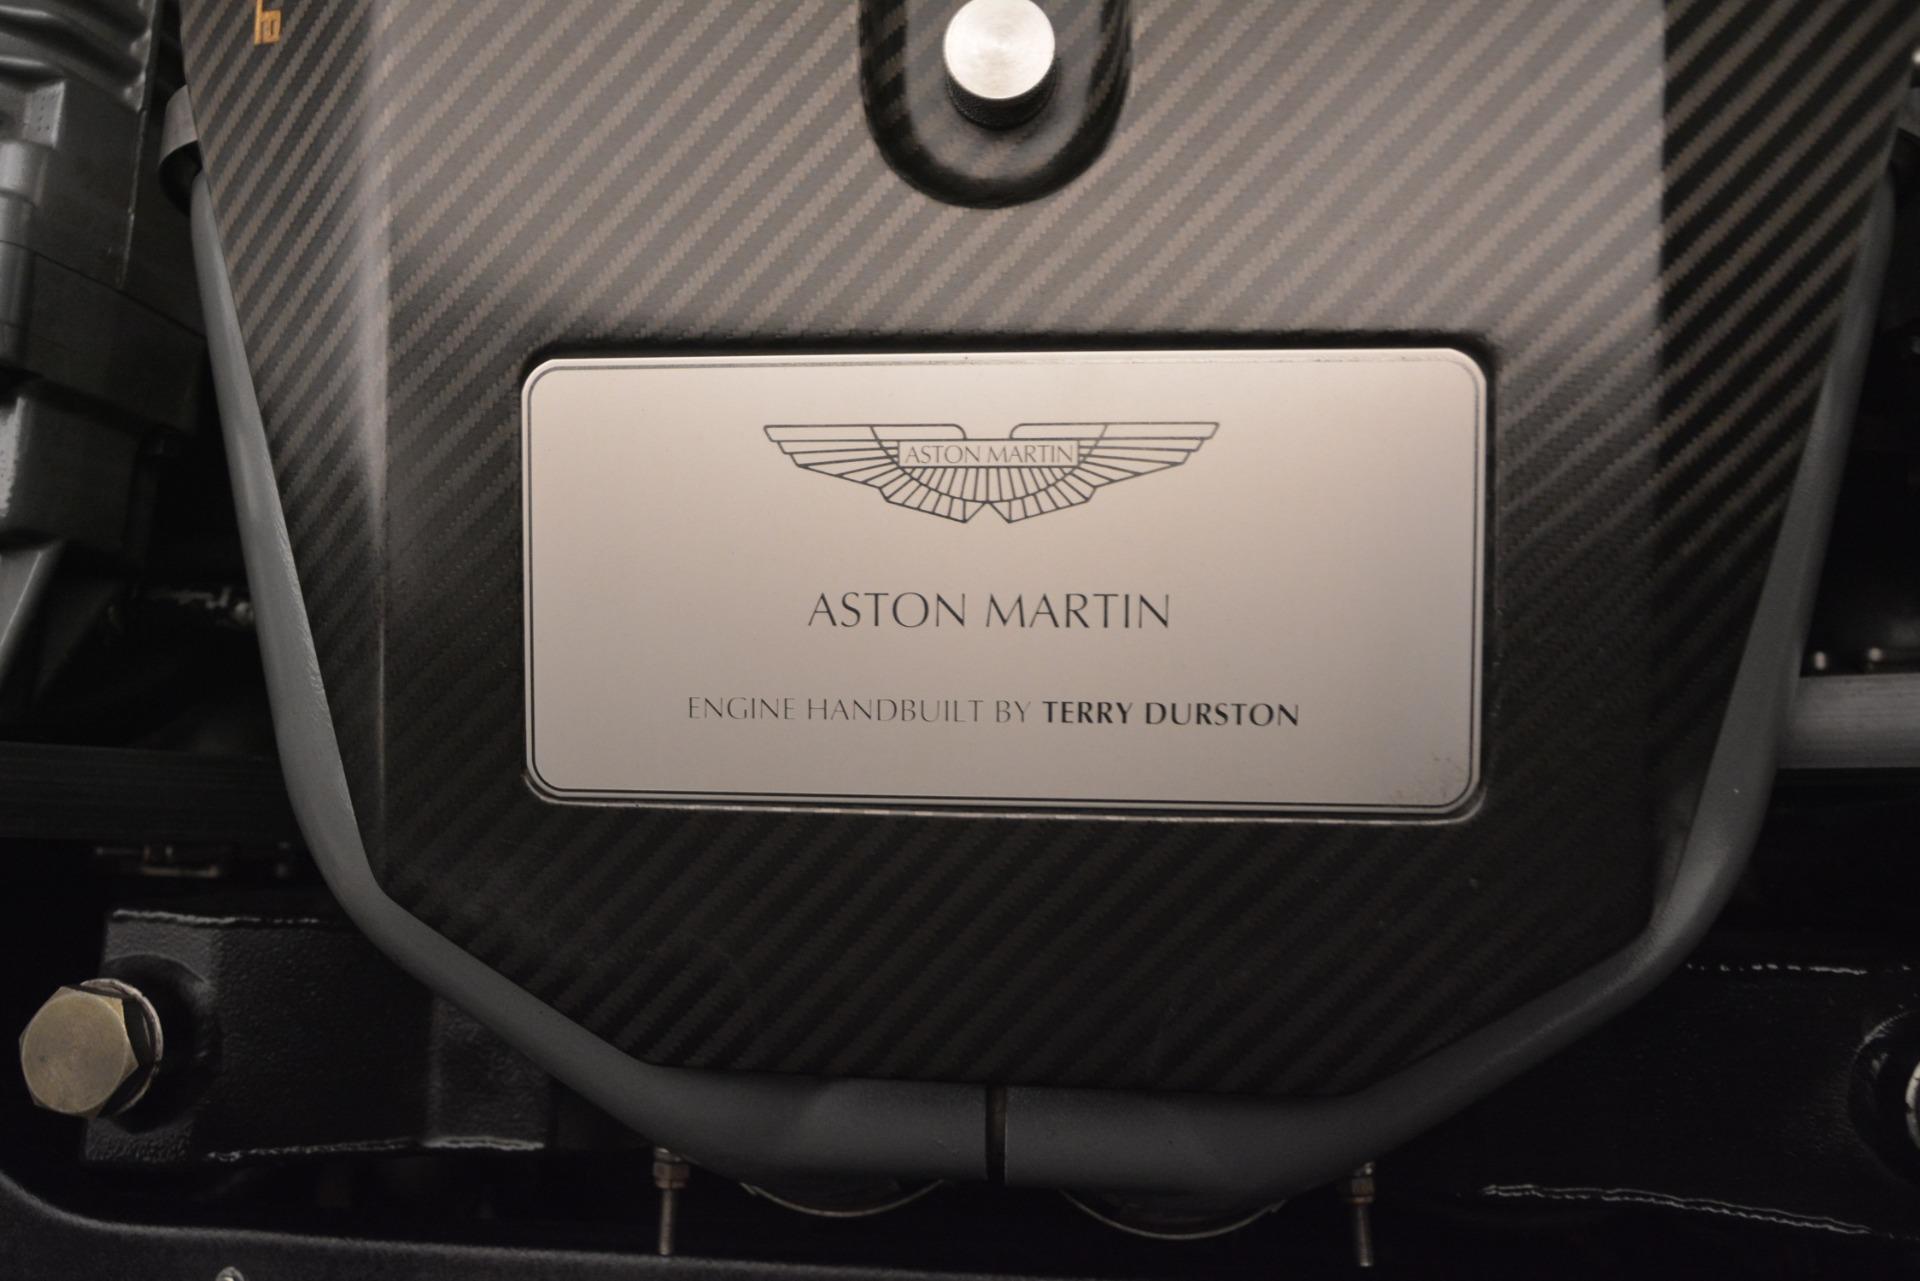 Used 1999 Aston Martin V8 Vantage Le Mans V600 Coupe For Sale In Greenwich, CT. Alfa Romeo of Greenwich, 7449C 2789_p31